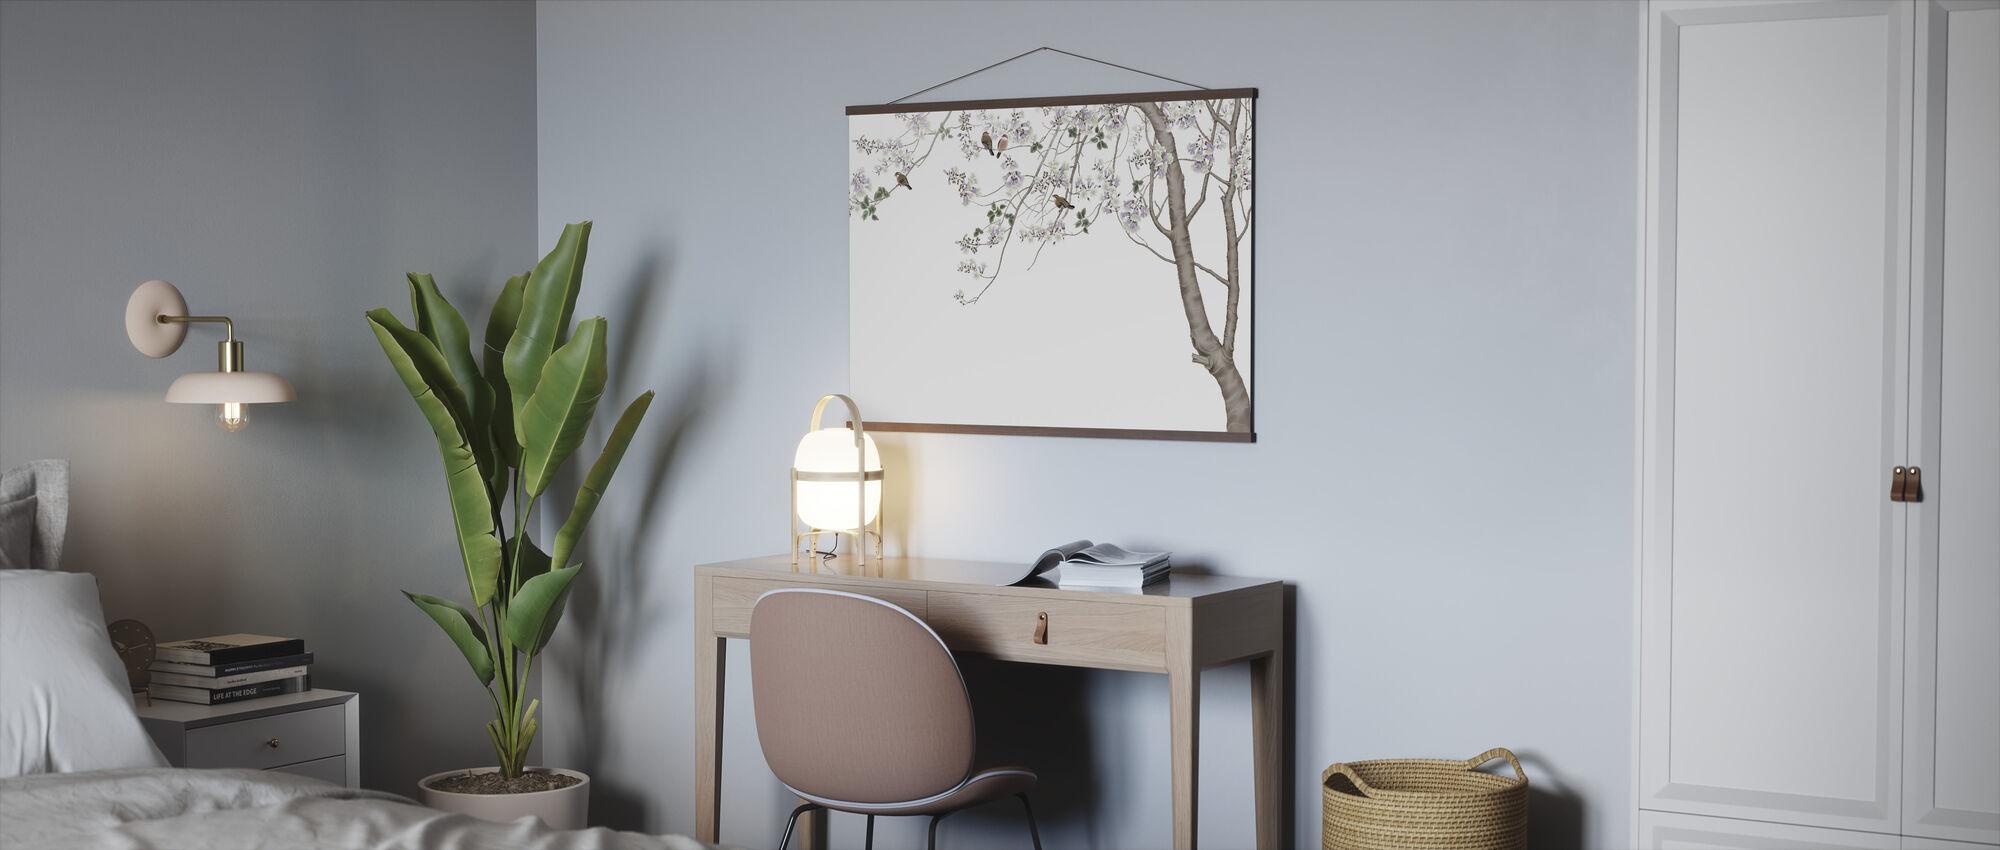 Bird Treet - Plakat - Kontor